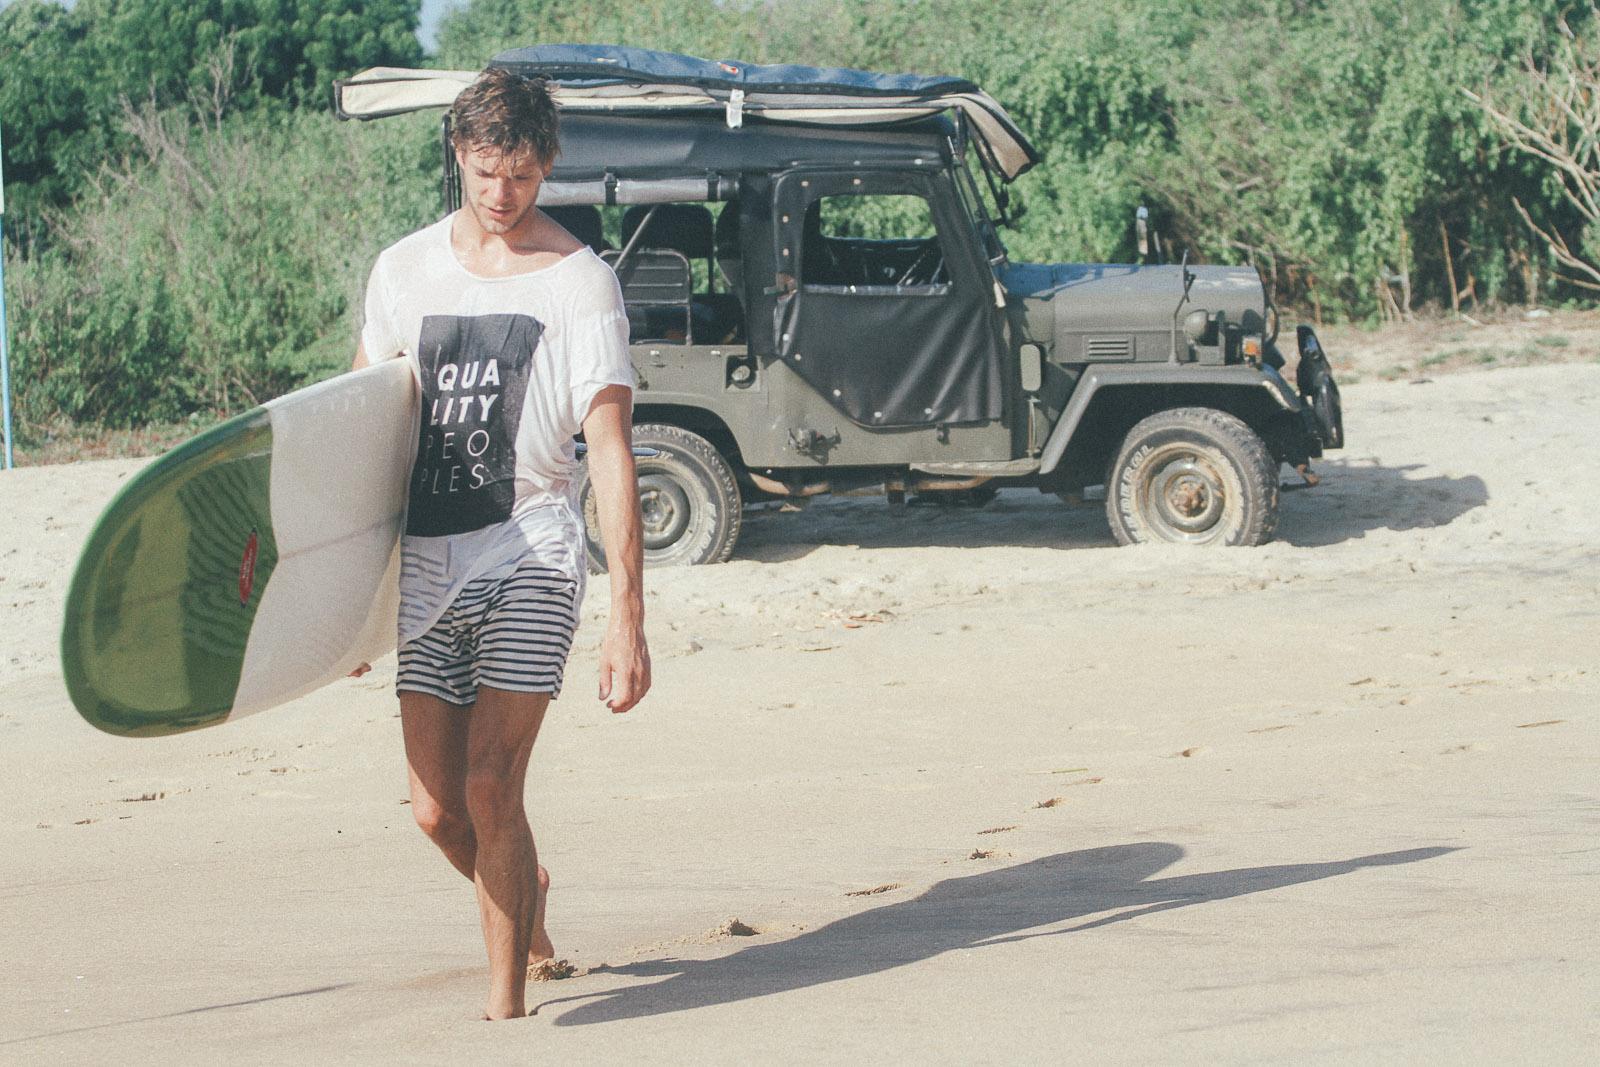 Sunshinestories-surf-travel-blog-IMG_9293